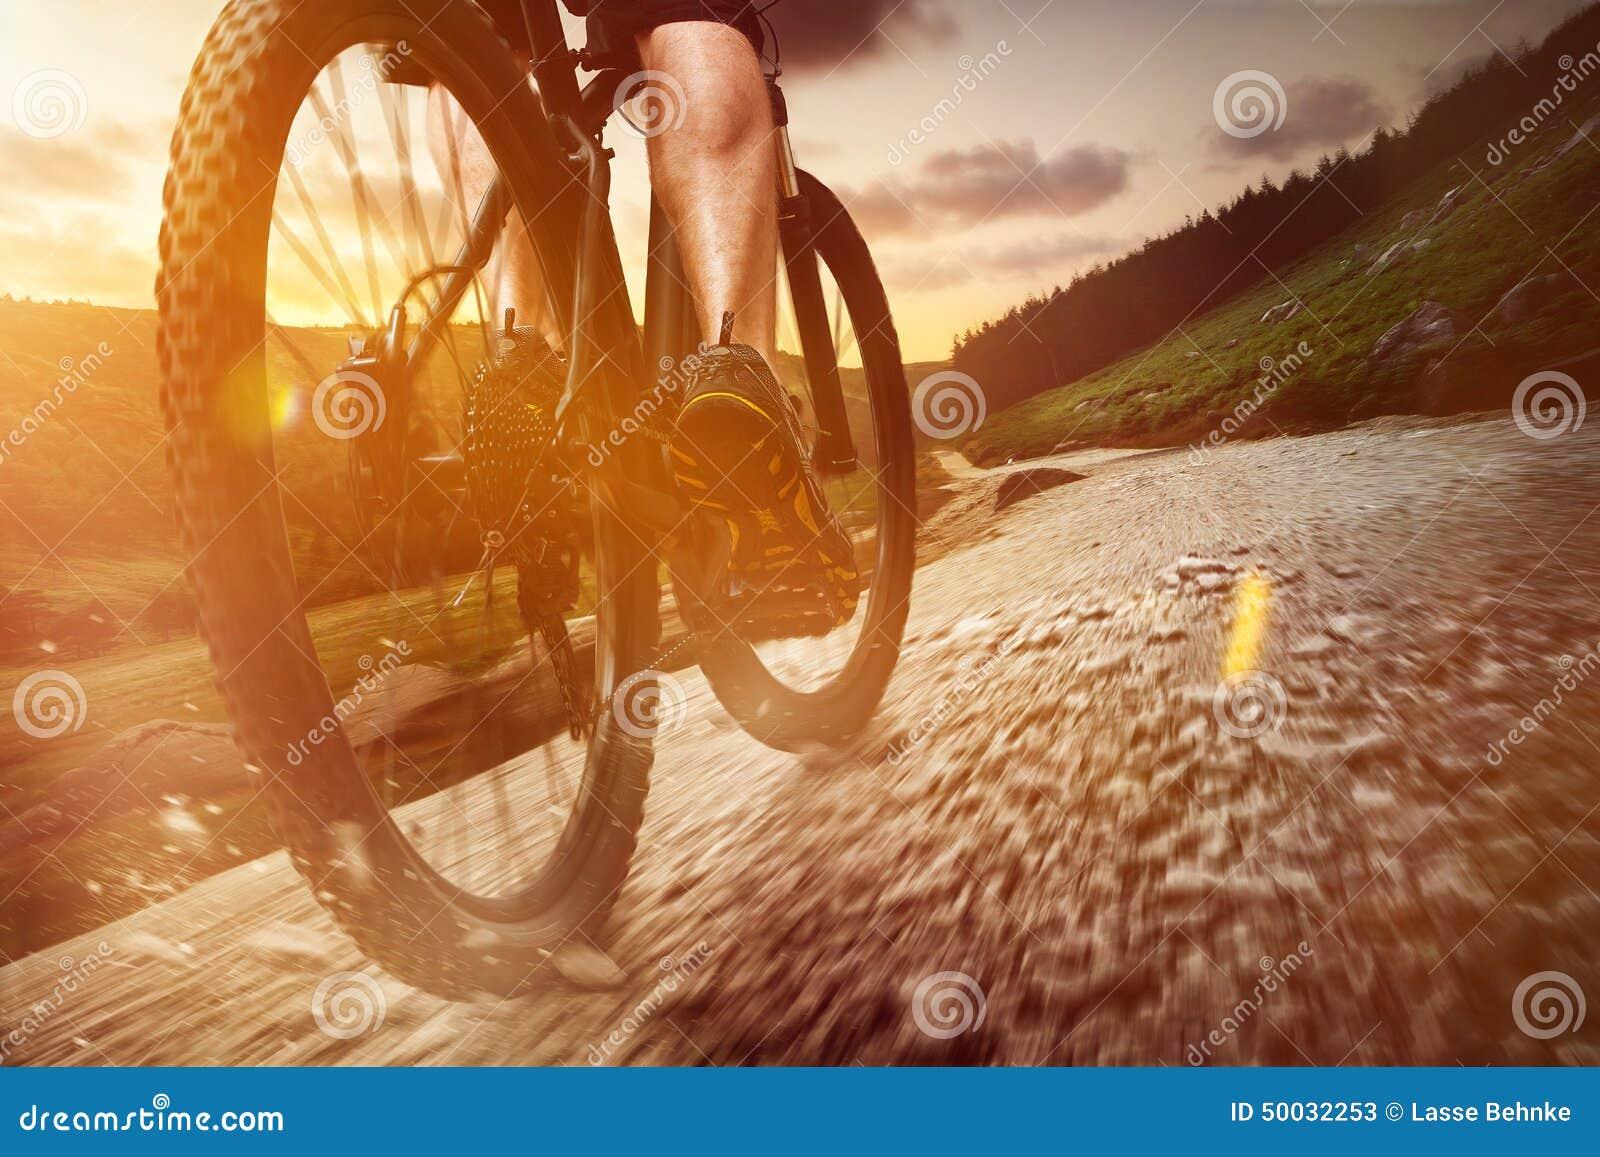 Download Mountain Bike stock image. Image of holidays, bicycle - 50032253